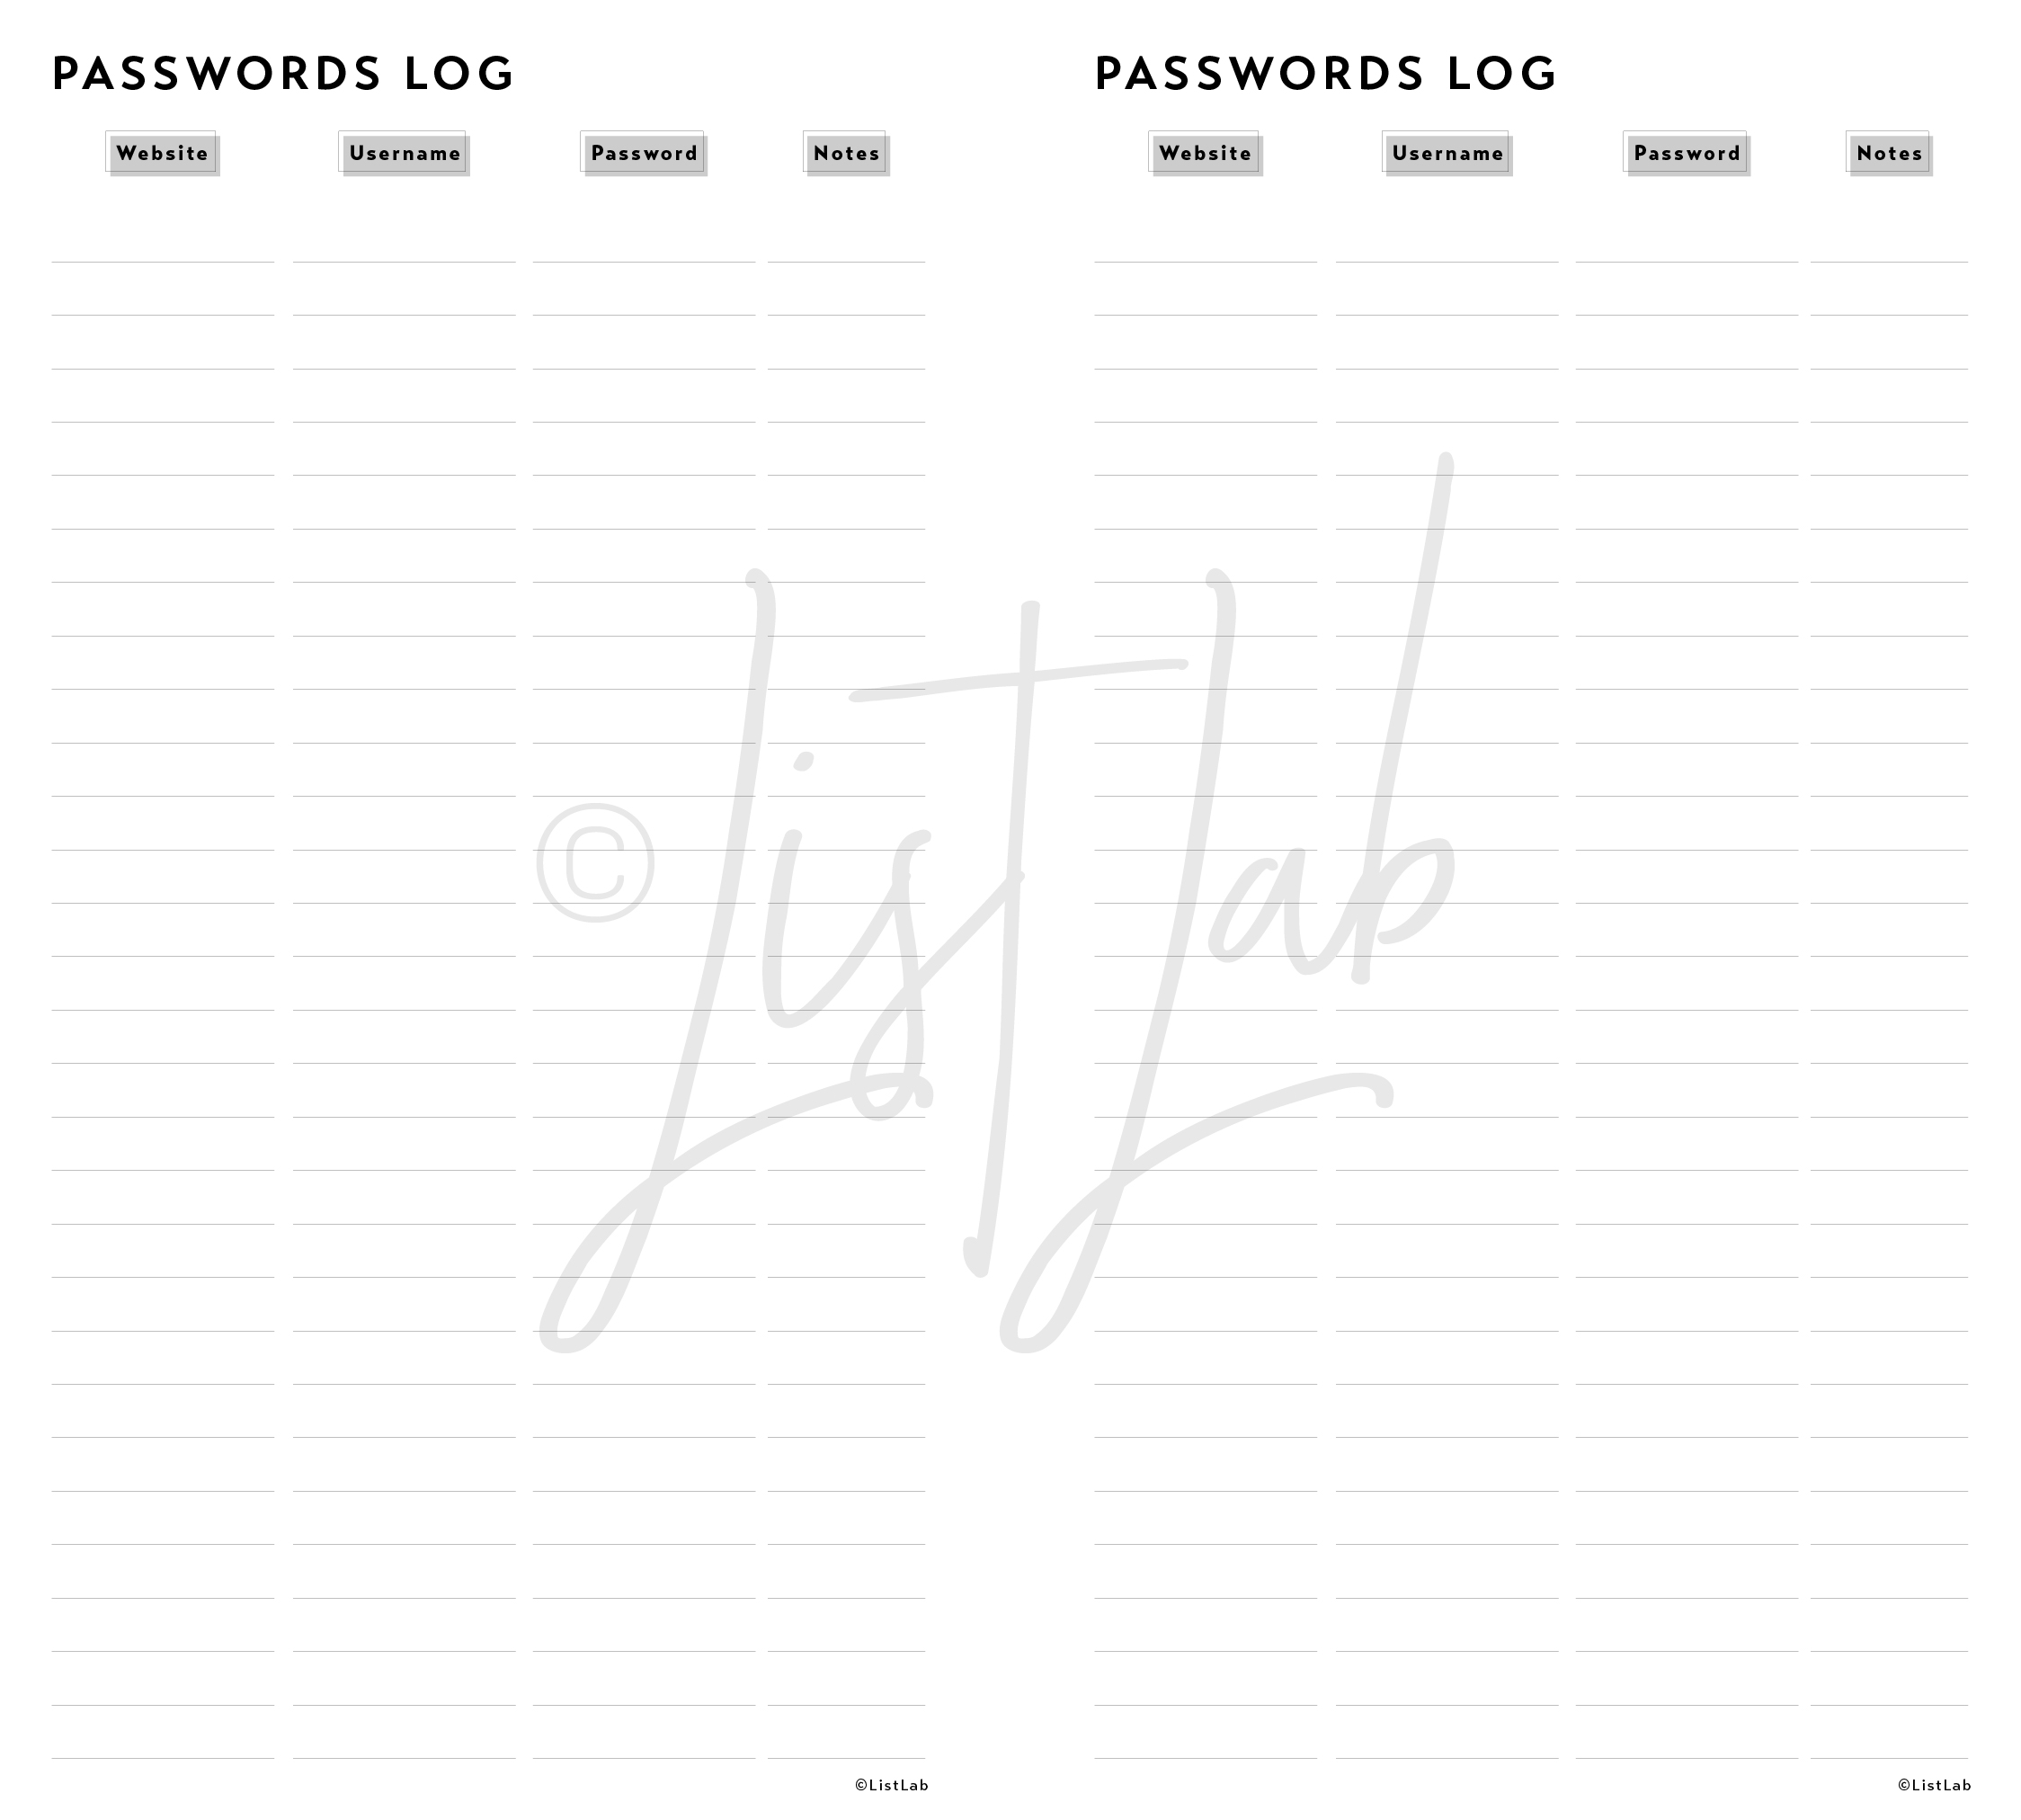 PASSWORDS LOG